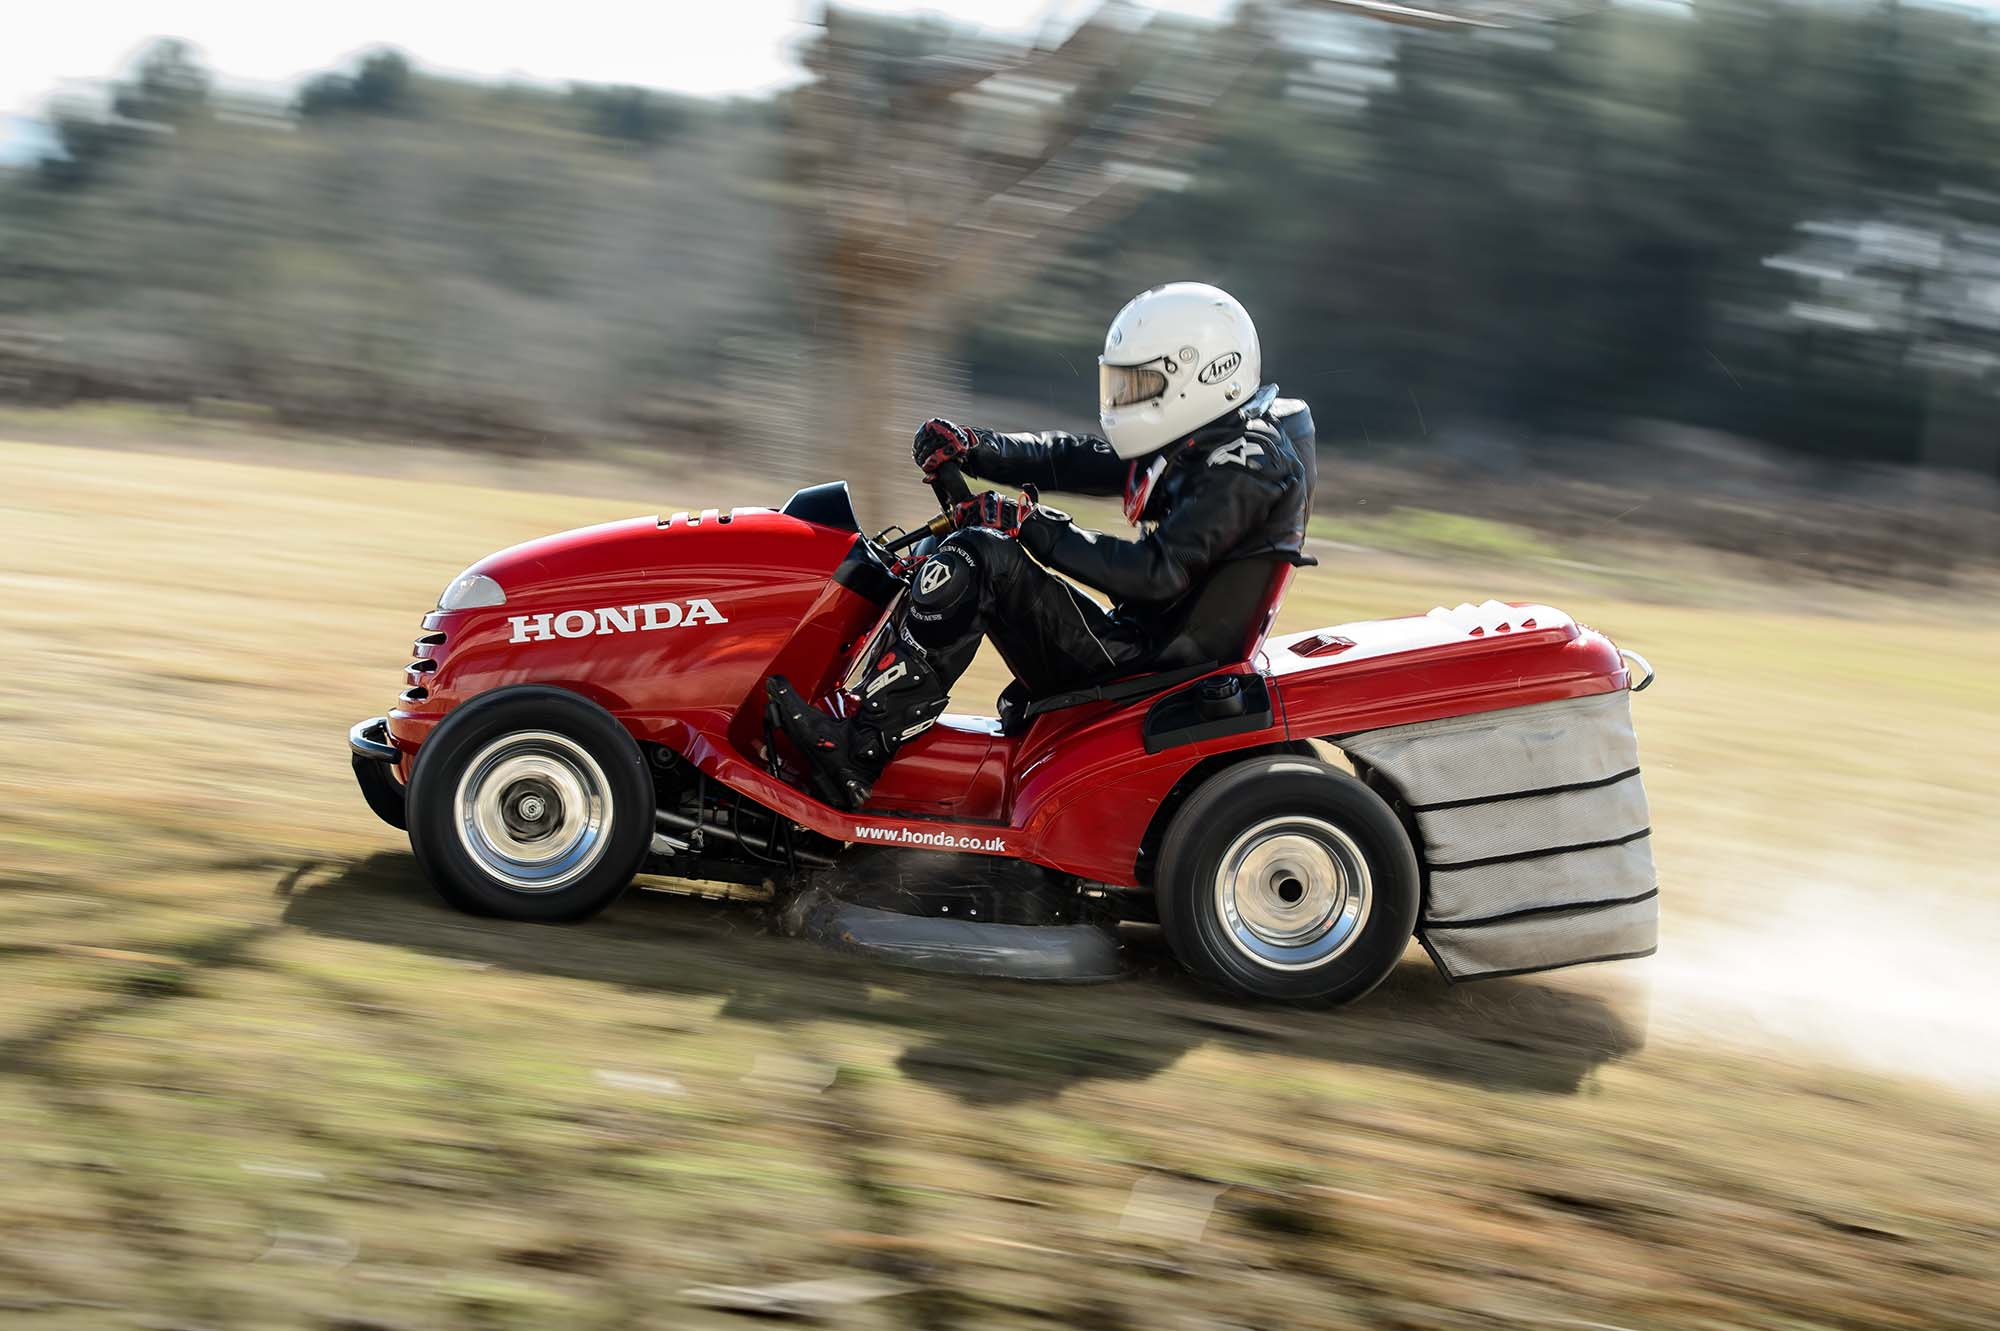 honda breaks world record for fastest lawn mower asphalt. Black Bedroom Furniture Sets. Home Design Ideas